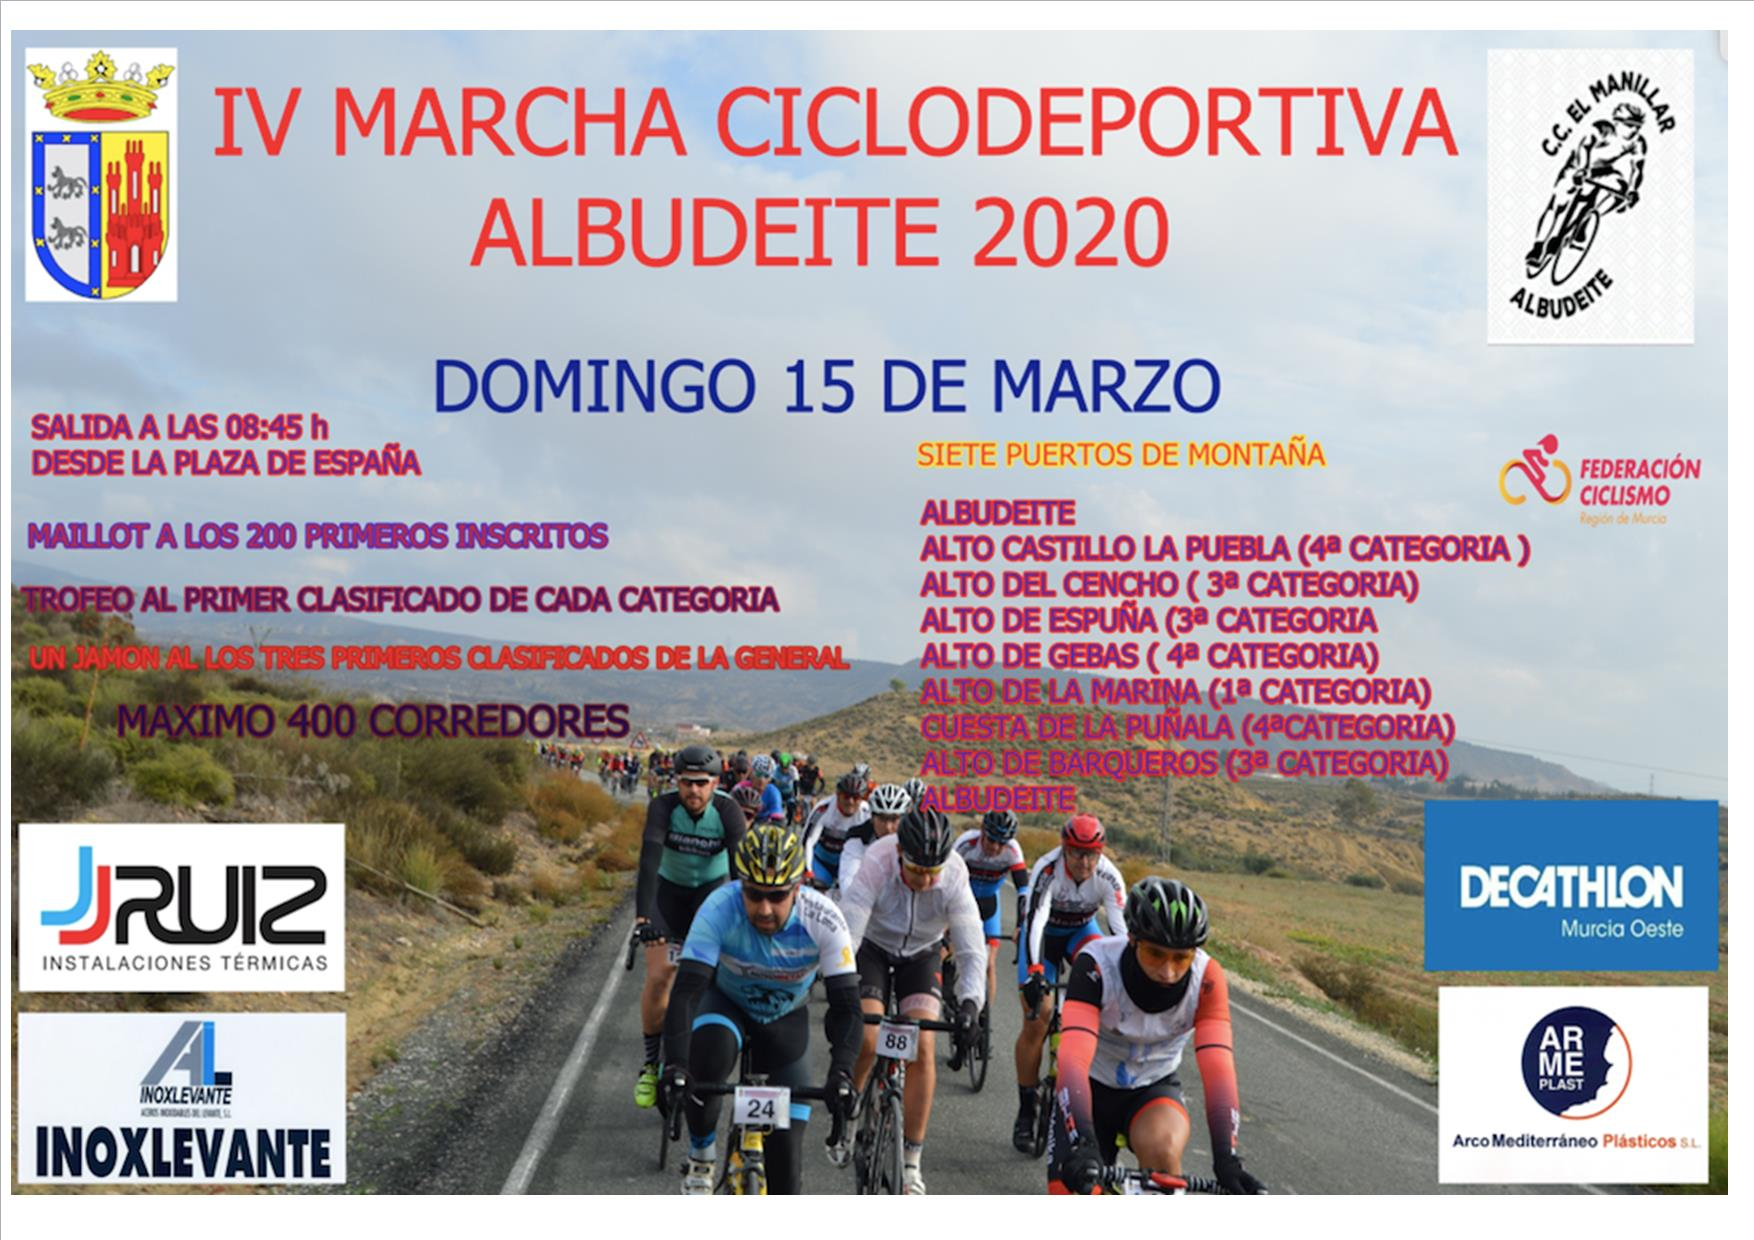 http://cronomur.es/assets/15MARZO.jpg